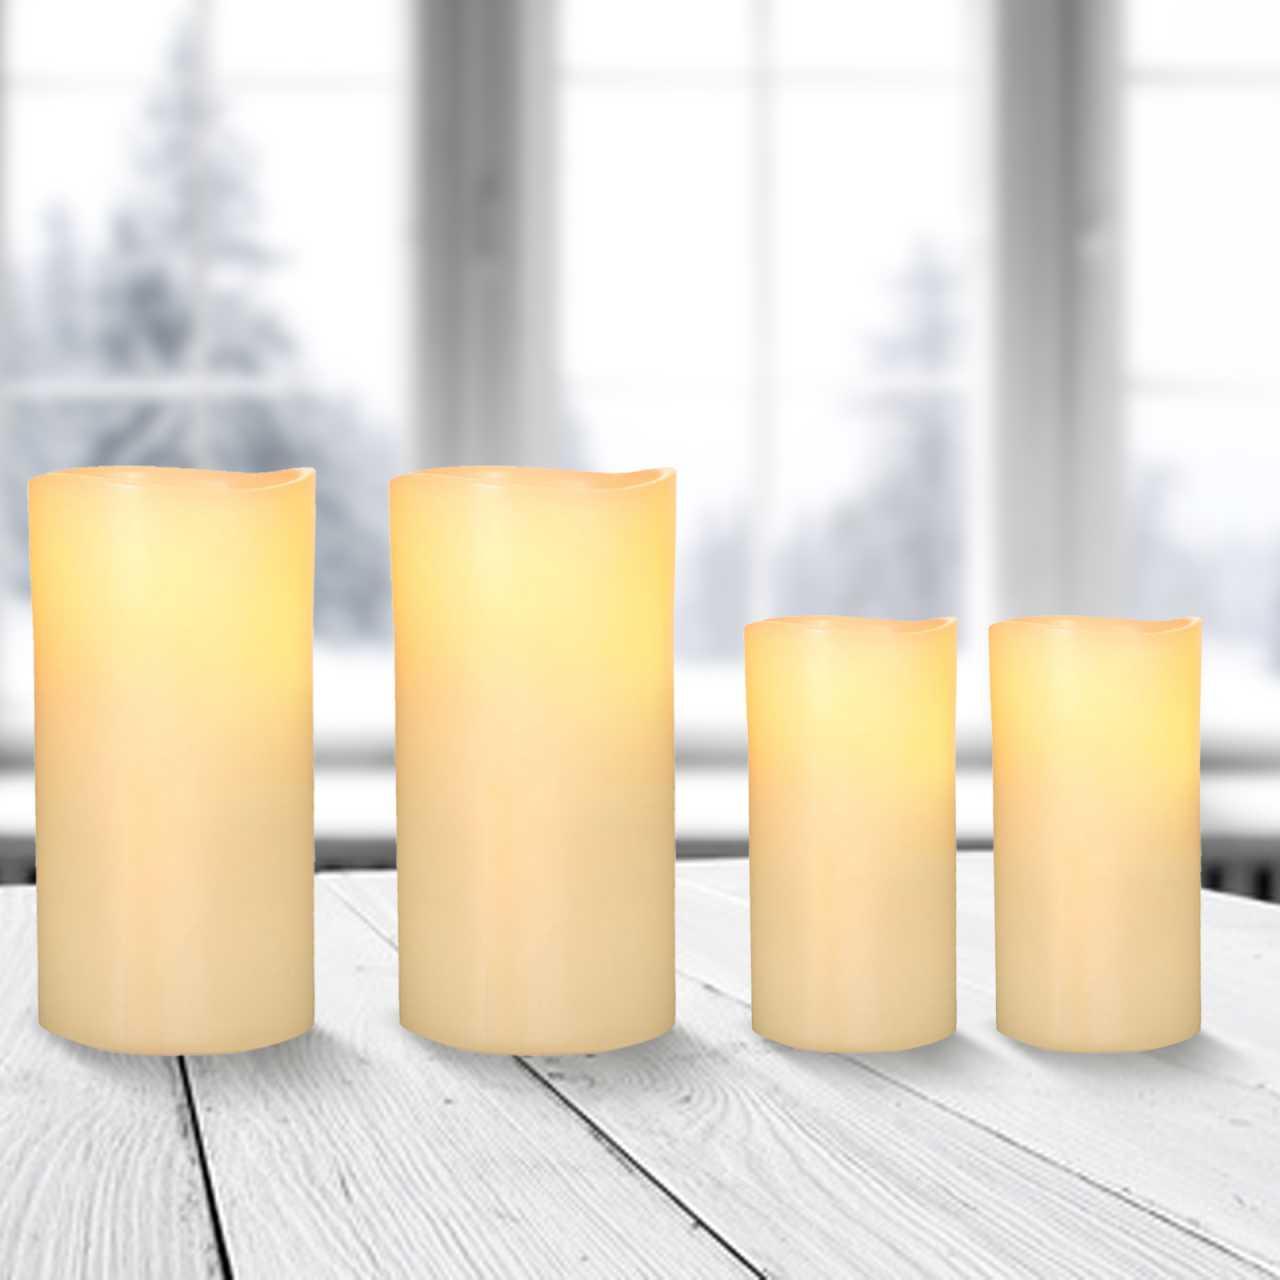 4x LED Kerzen Echtwachs Flackereffekt Ø 7,5cm Höhe 15cm / 19,5cm